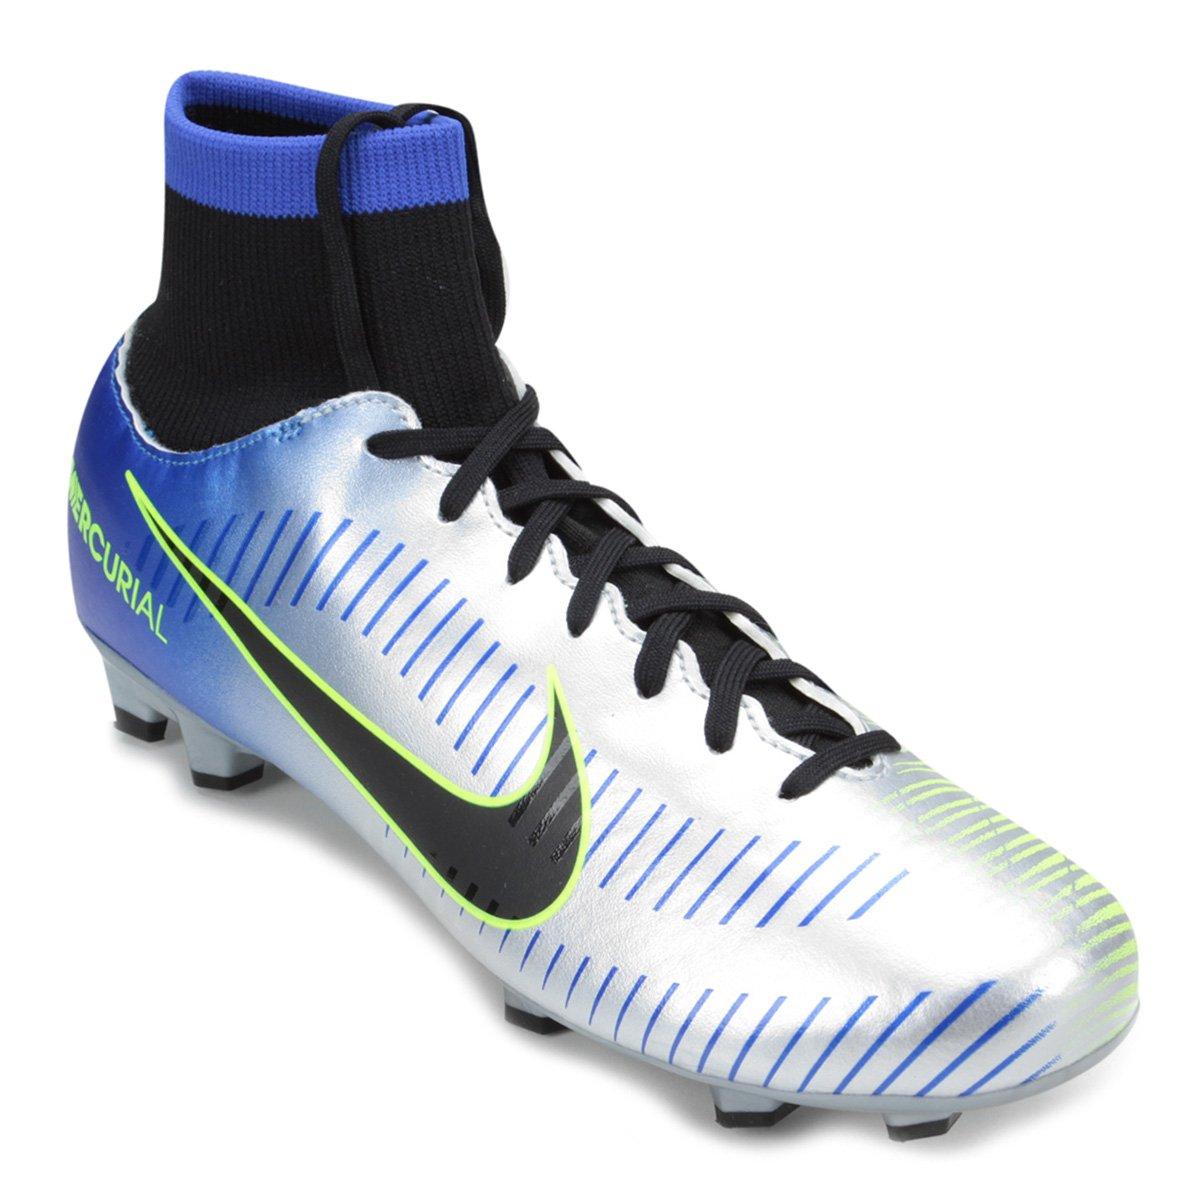 menos articulo boleto  Chuteira Campo Nike Mercurial Victory 6 DF Neymar Jr FG - Tam: 37 -  Shopping TudoAzul